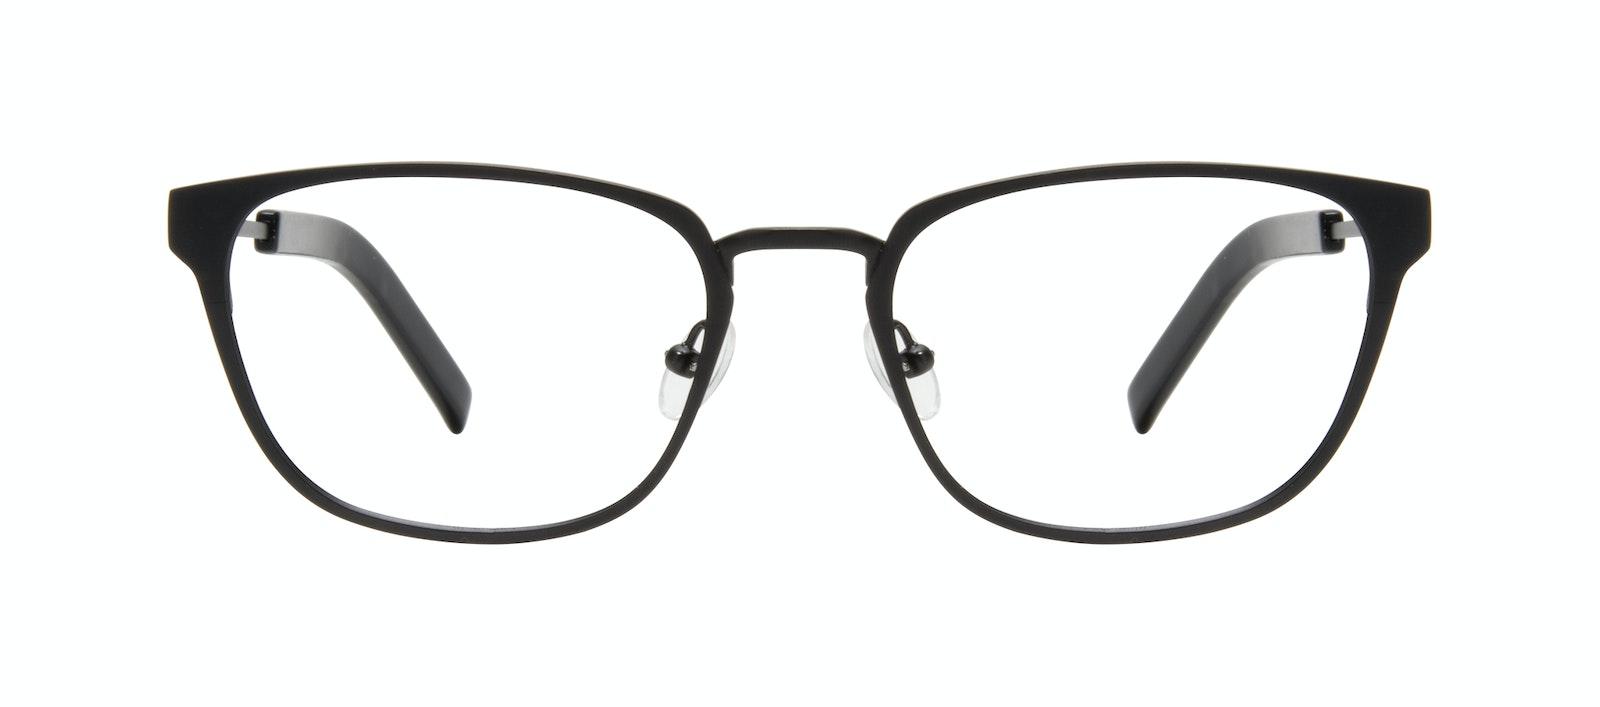 Affordable Fashion Glasses Square Eyeglasses Men Flex Onyx Matte Front